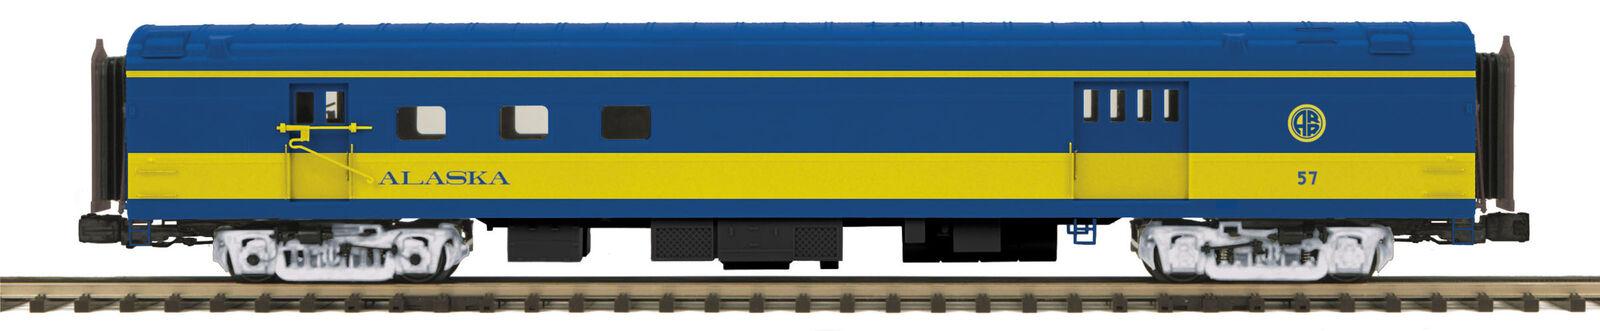 MTH 1 48 O Scale 70' Streamlined RPO Passenger Car Alaska  57  20-68256